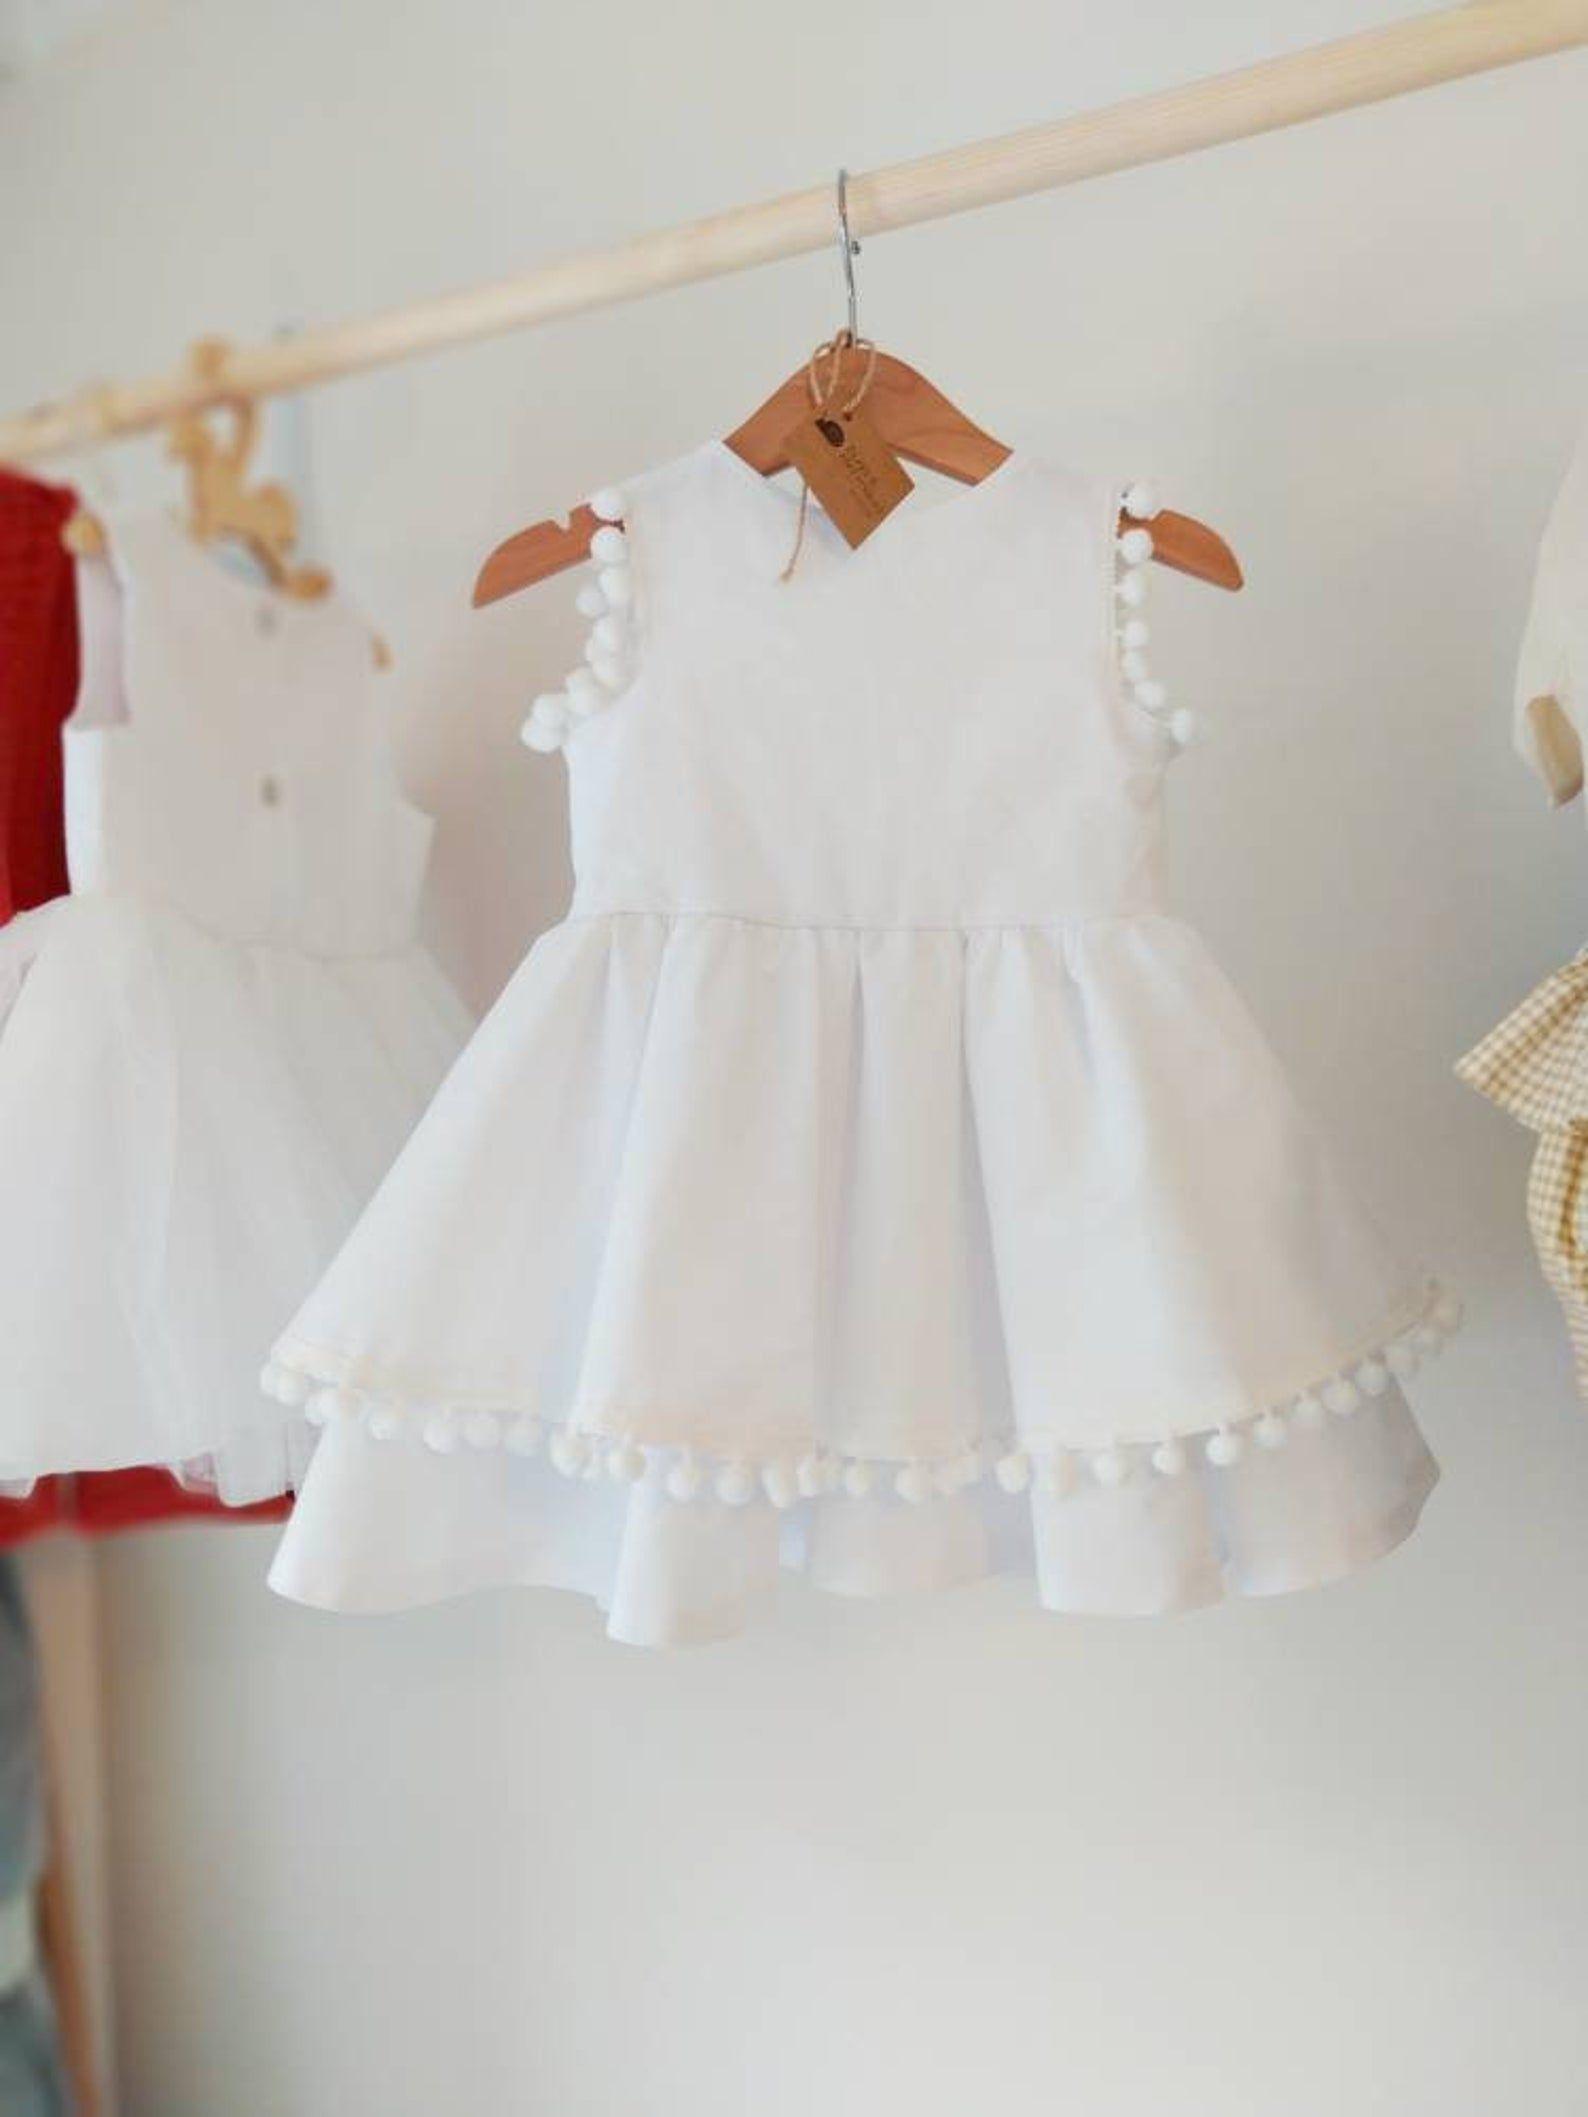 Flowergirl White Dress Newborn Baby Dress Girls Dress Naming Etsy 1st Birthday Girl Dress Birthday Girl Dress Newborn Dresses [ 2117 x 1588 Pixel ]